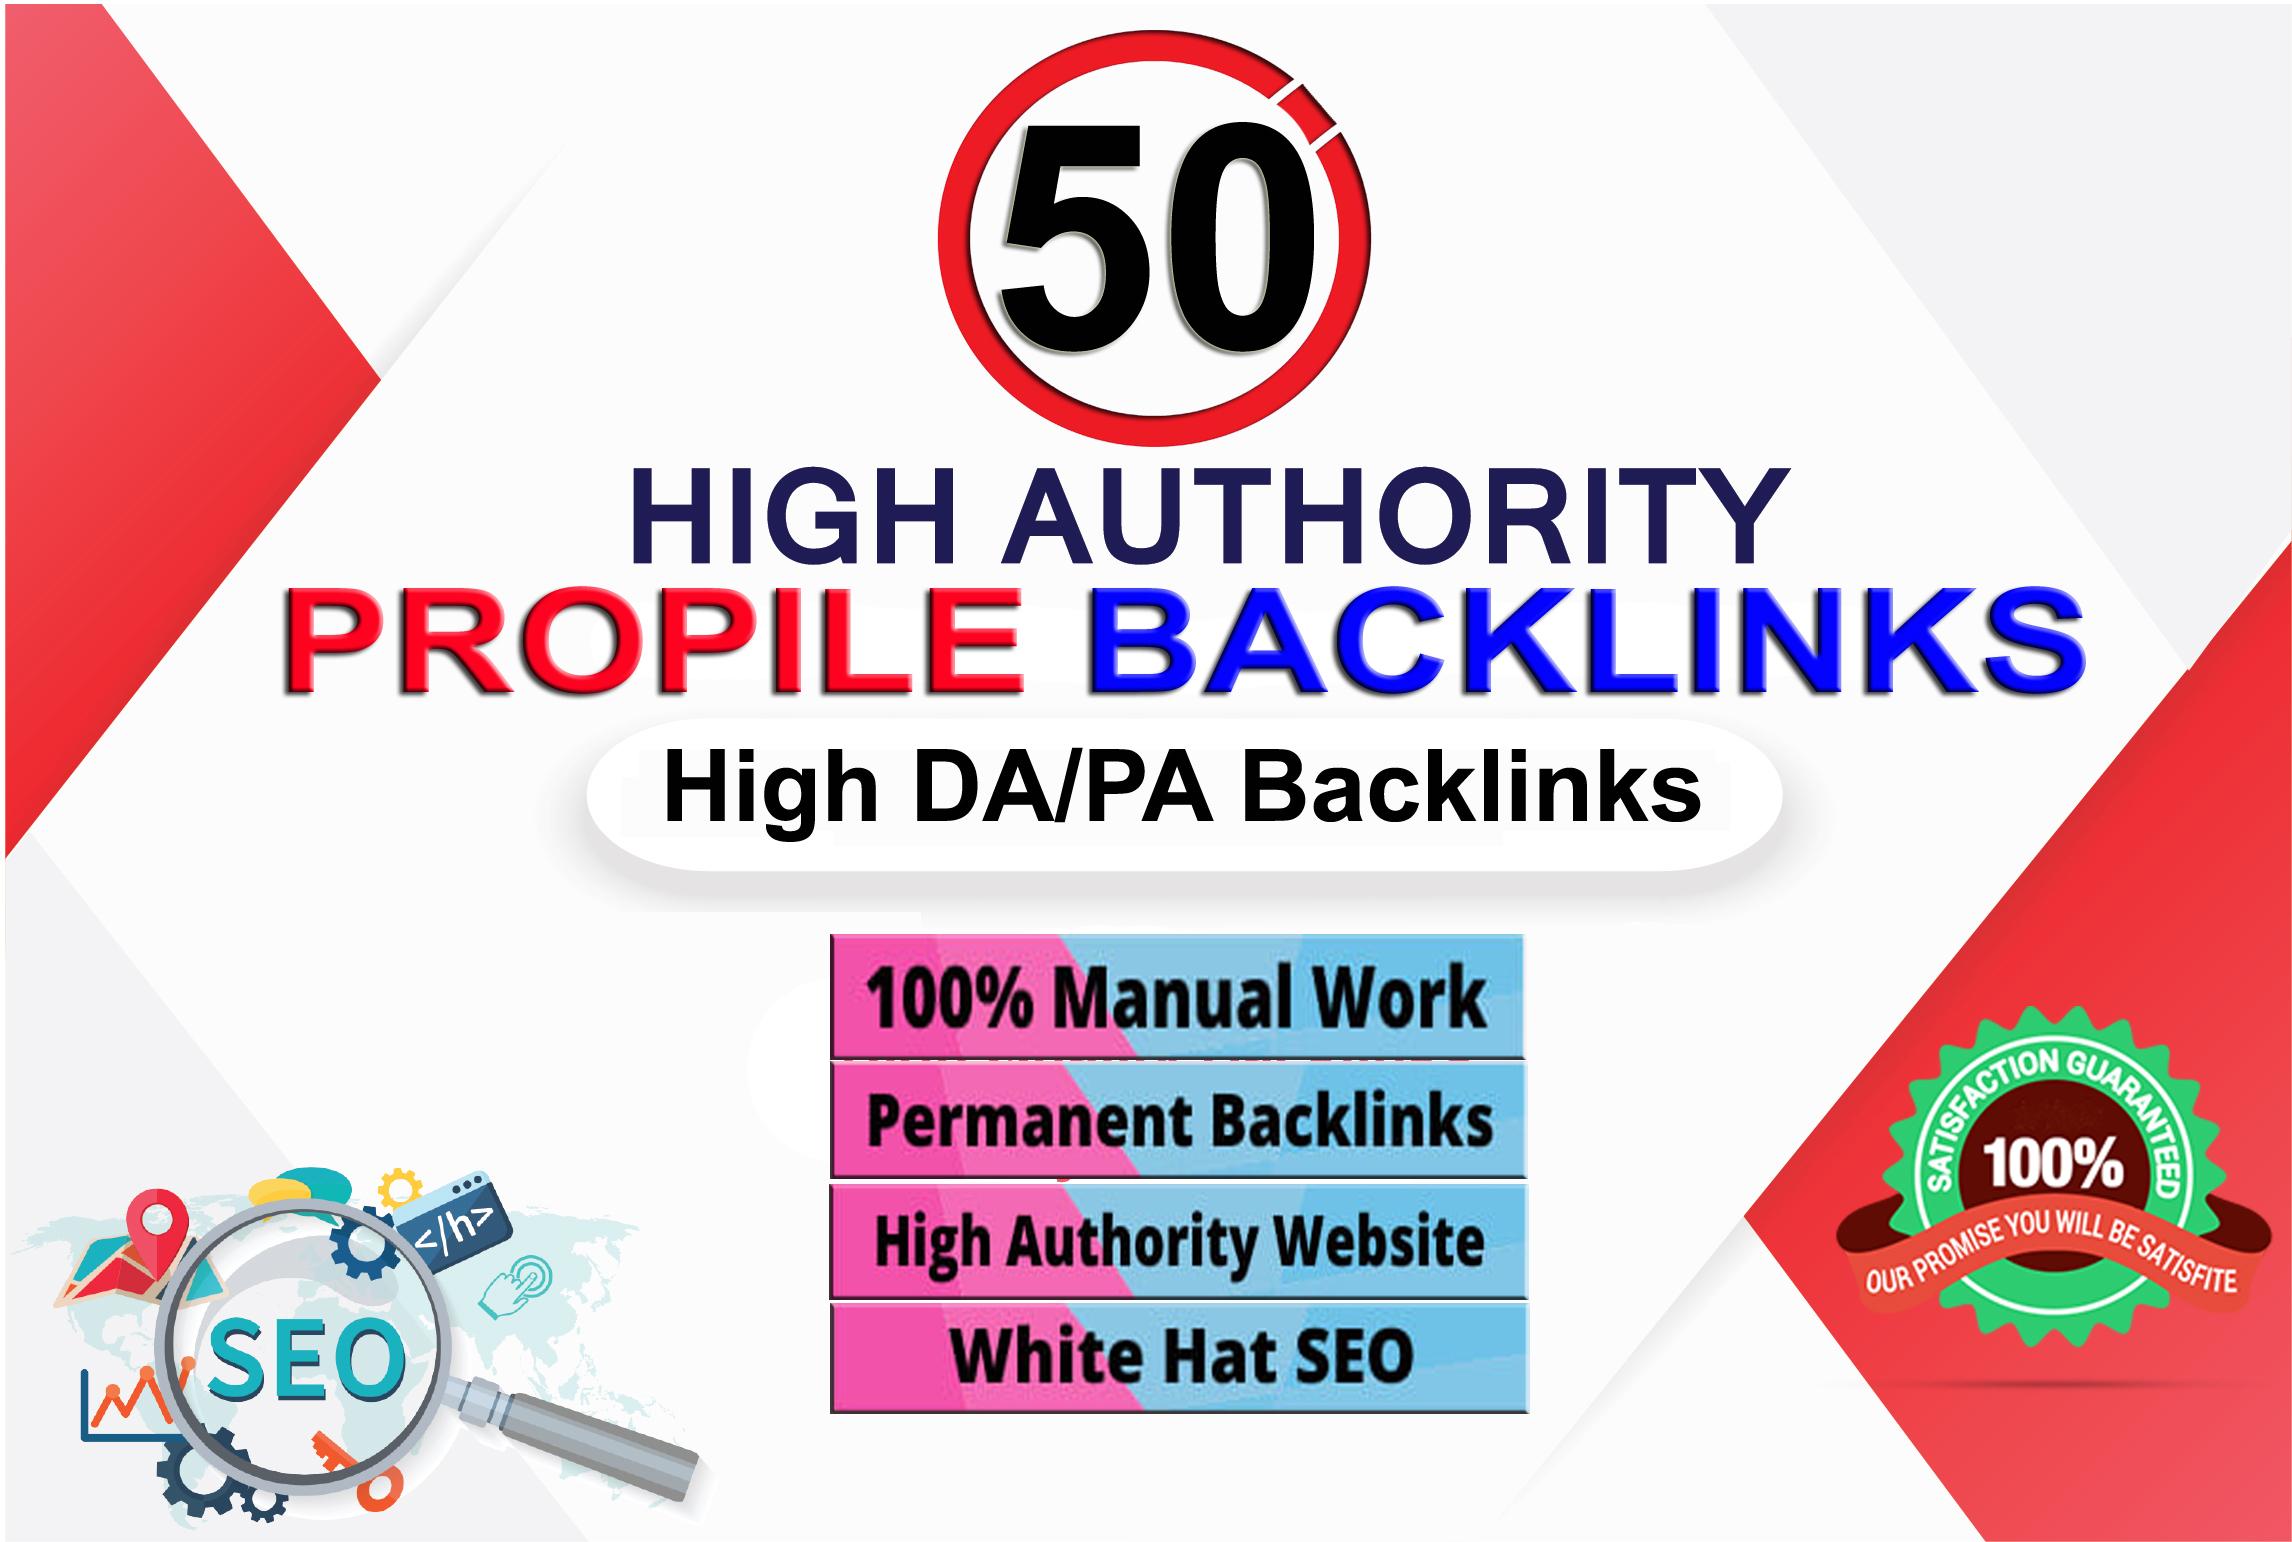 I will create manually 50 High Authority profile backlinks for SEO. 100 Satisfaction Guarantee.